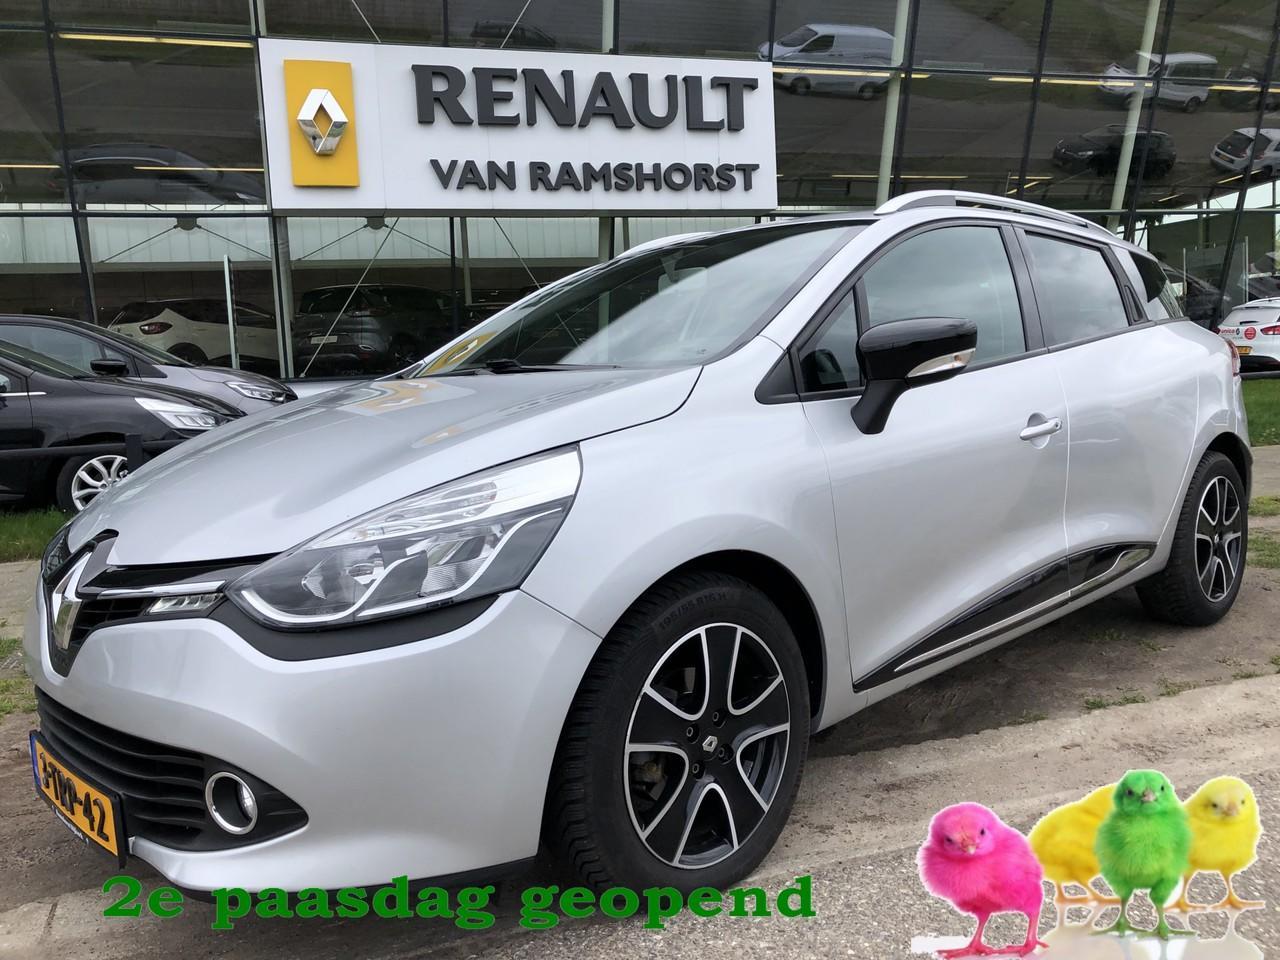 "Renault Clio Estate 1.5 dci 90pk eco dynamique r-link keyless airco 16""lmv 2e paasdag open 10.00 - 17.00 uur"